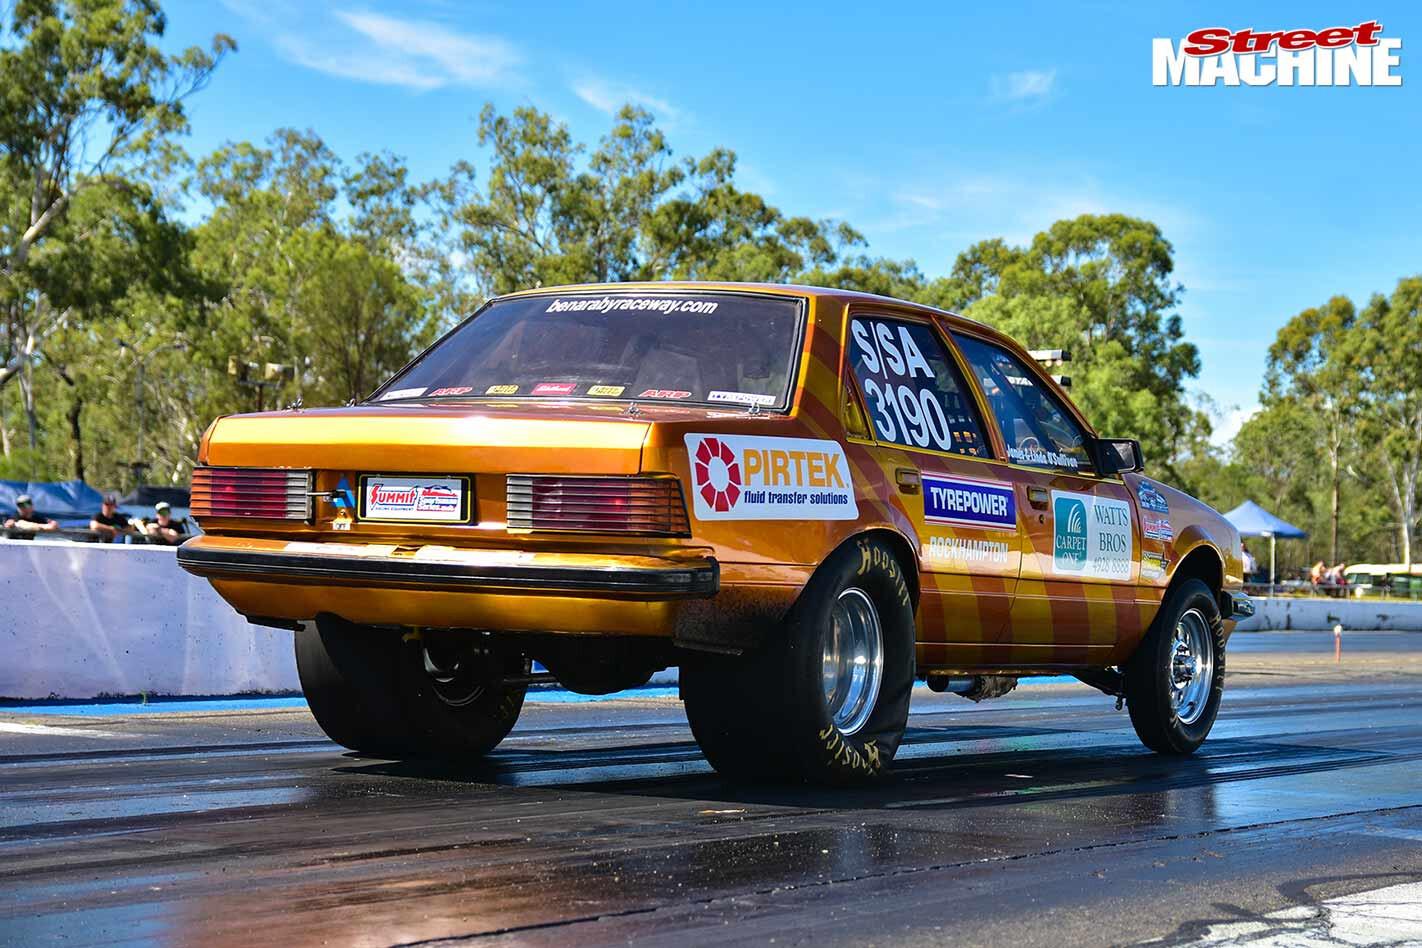 Kenda Tires 660 Drag Radial Series